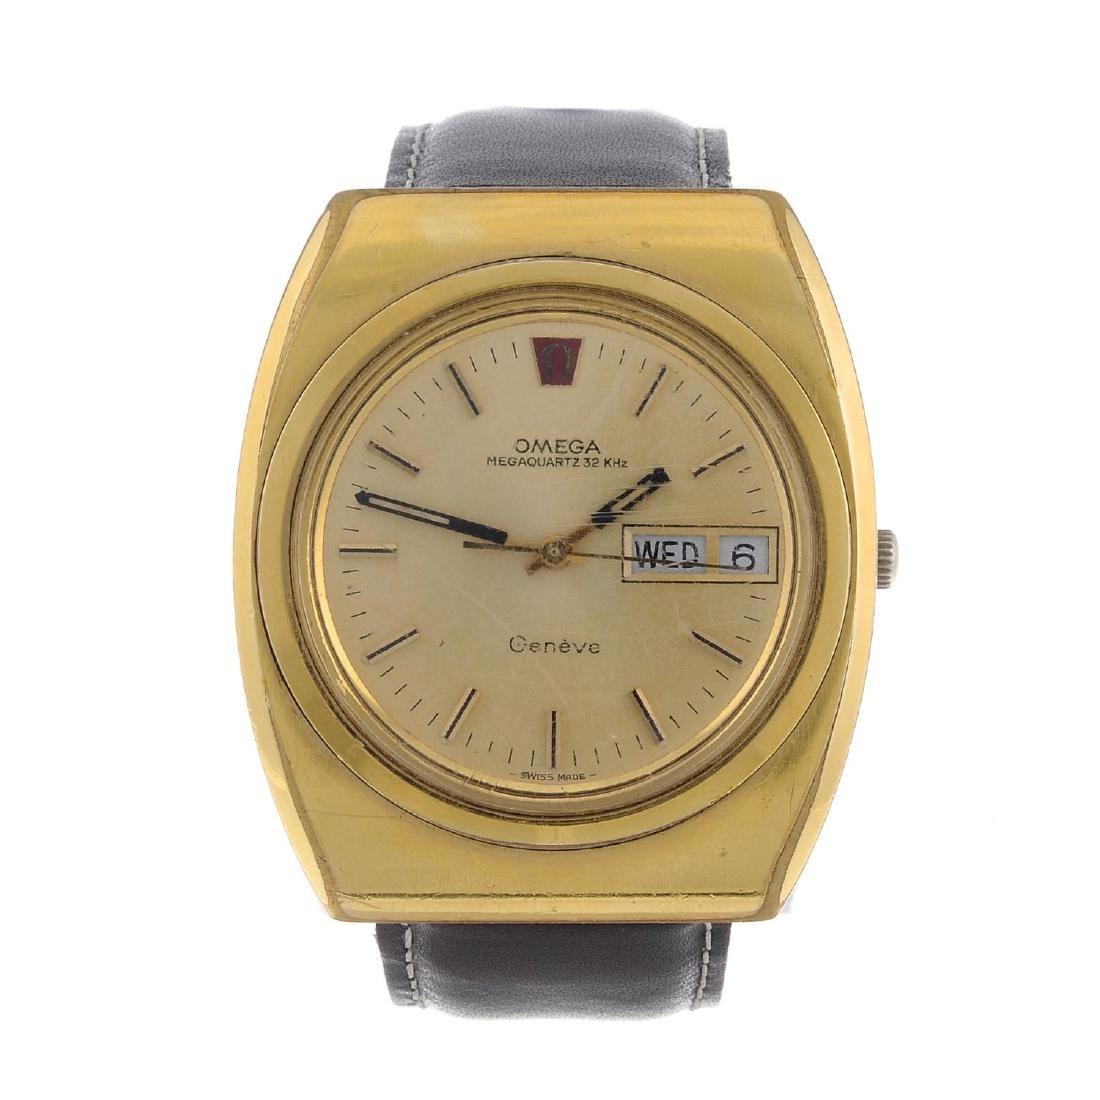 OMEGA - a gentleman's Genève Megaquartz 32Kh wrist